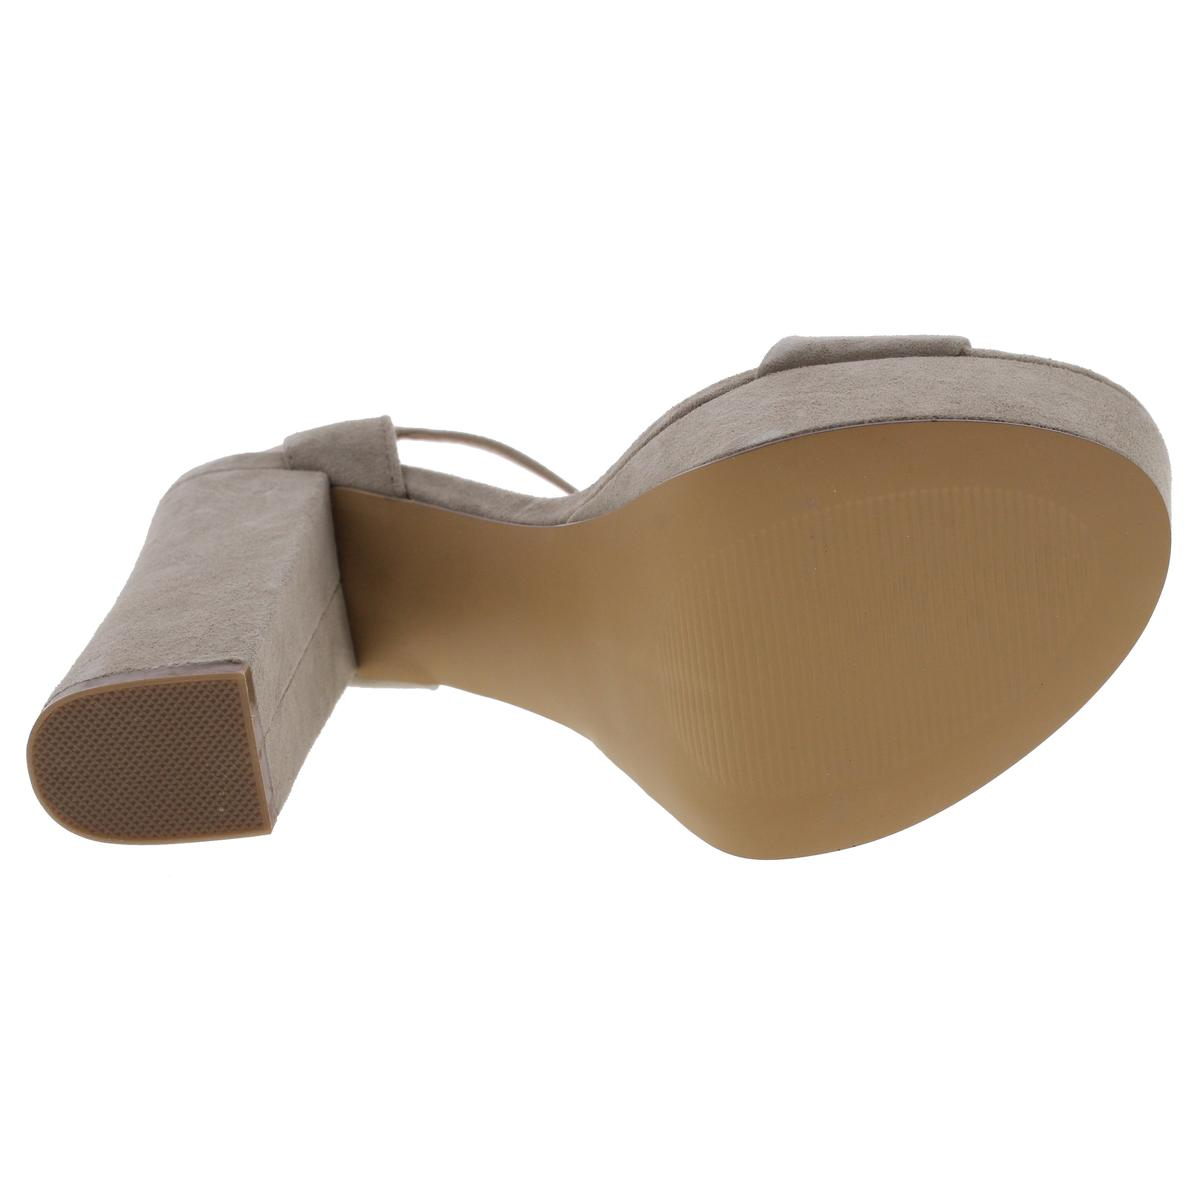 Steve-Madden-Womens-Joline-Suede-Covered-Heel-Platform-Sandals-Shoes-BHFO-8617 thumbnail 10